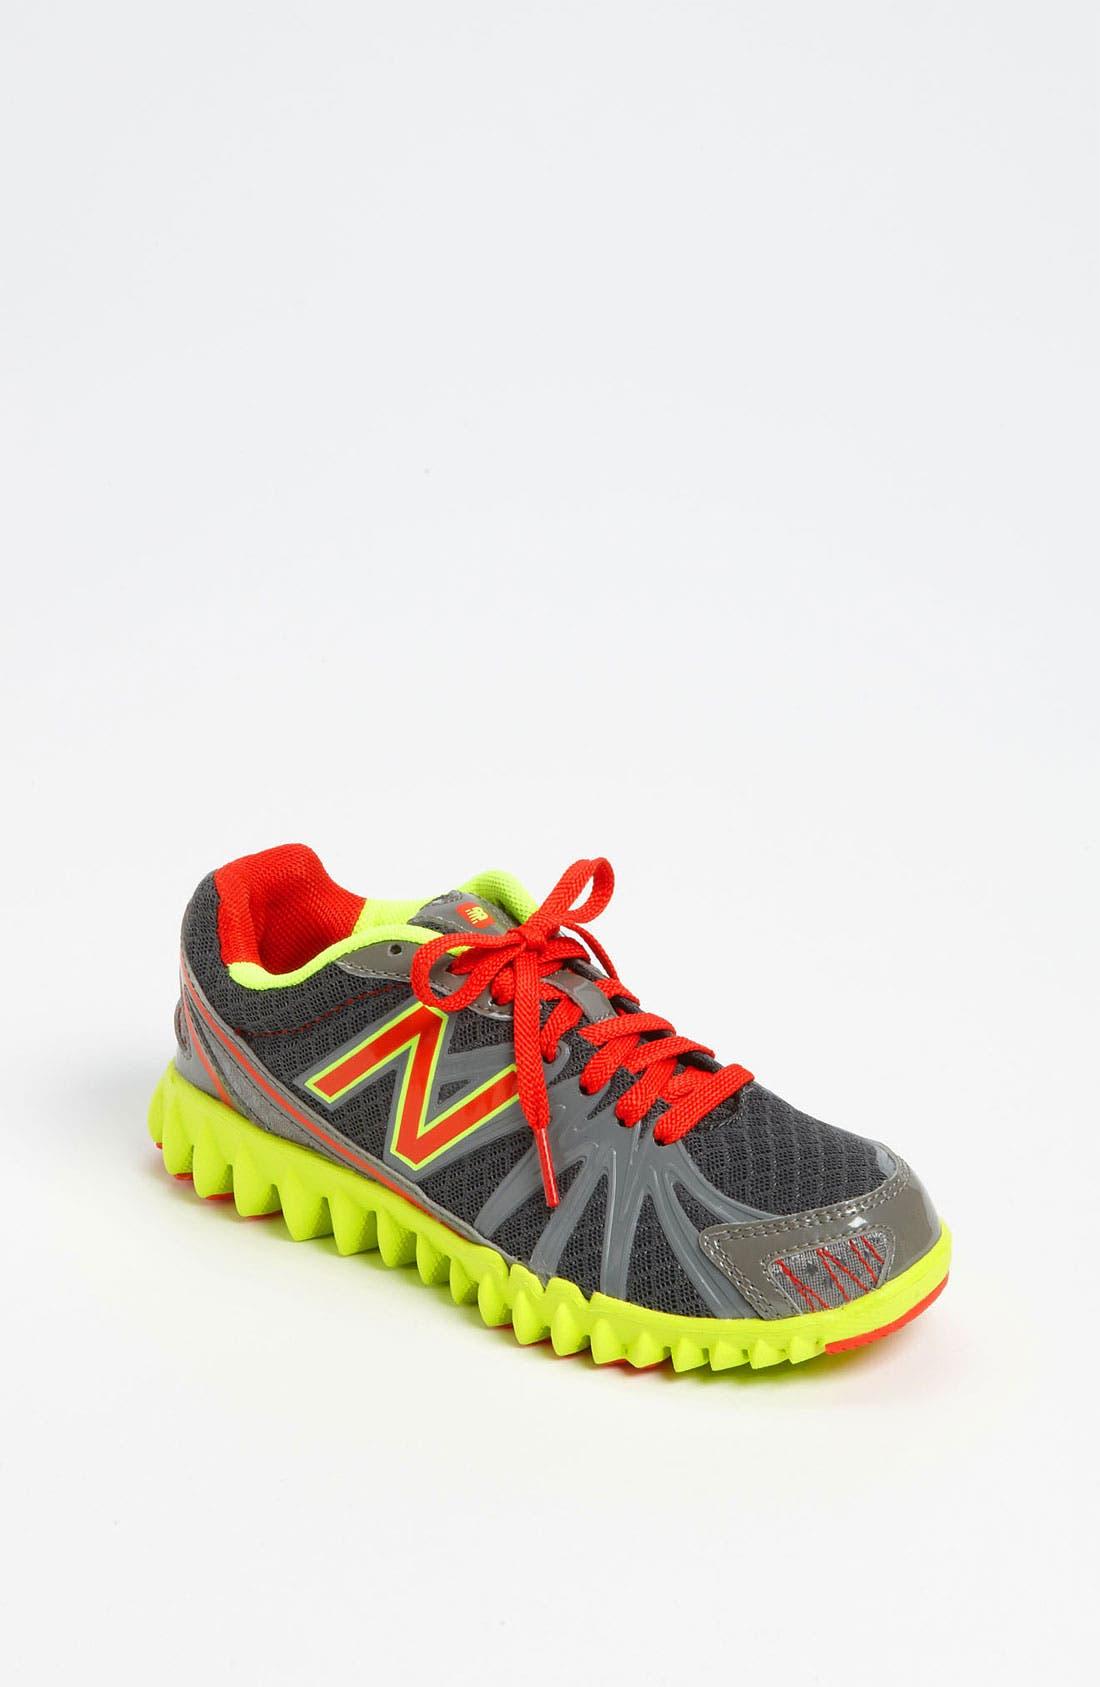 Alternate Image 1 Selected - New Balance 'Gruve 2750' Running Shoe (Toddler, Little Kid & Big Kid)